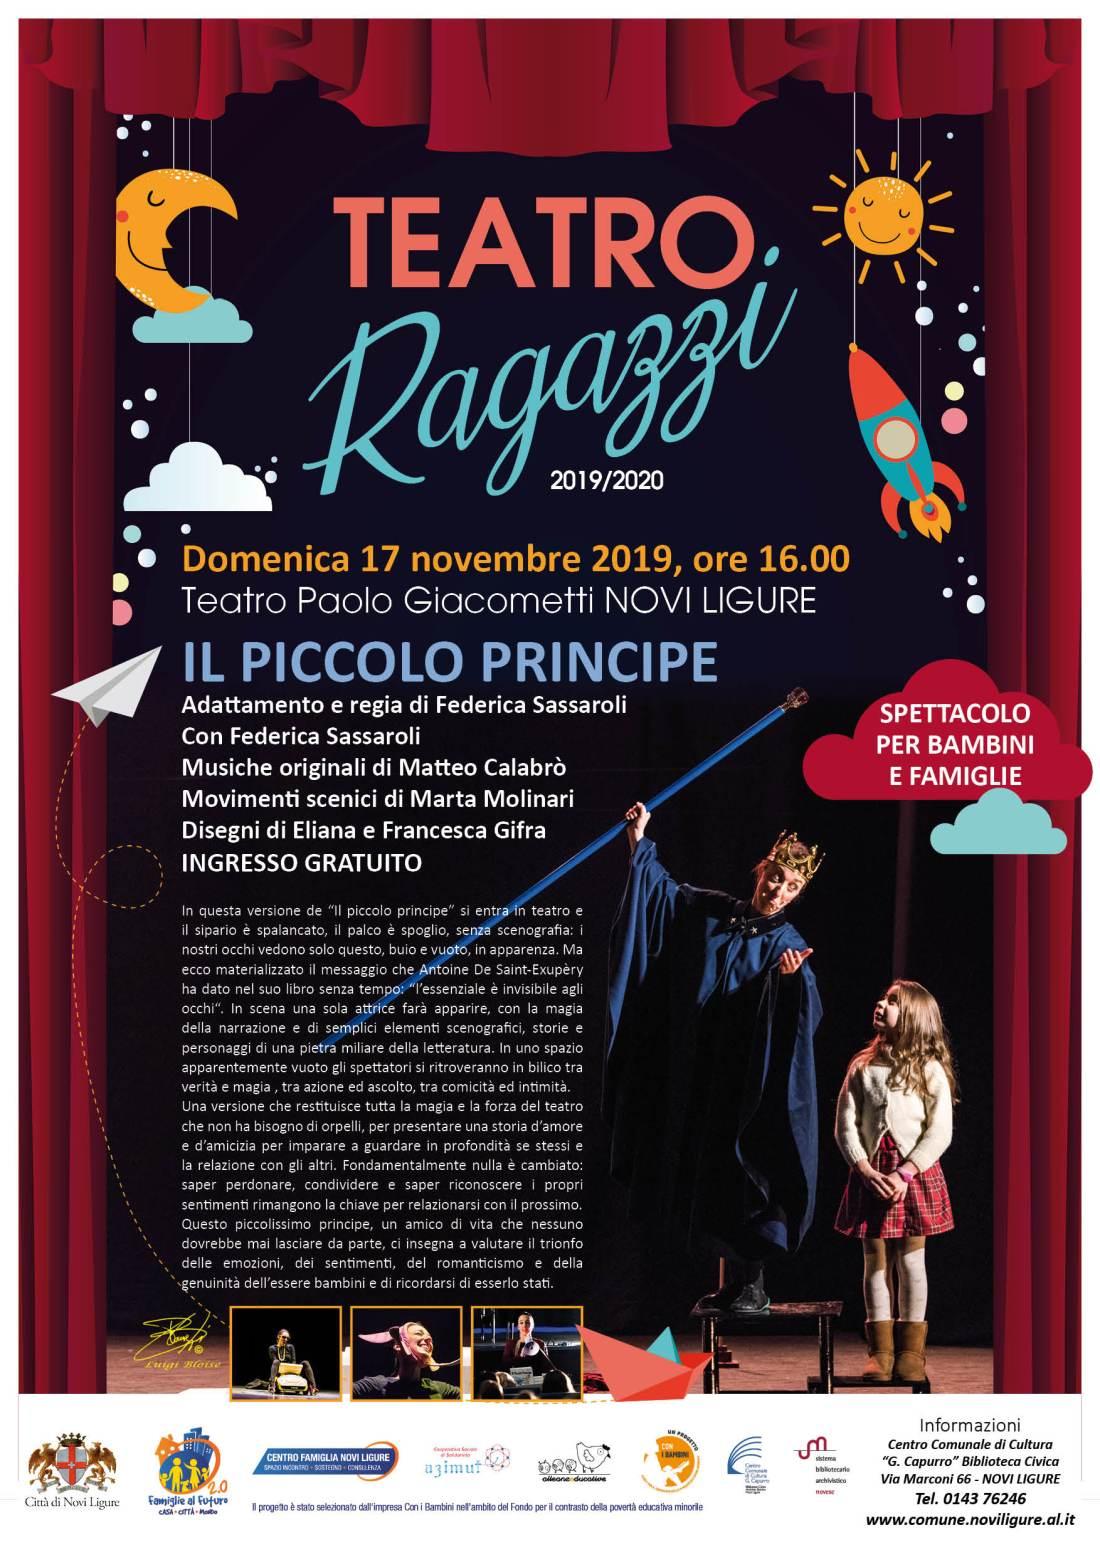 Giacometti teatroragazzi2019-20-sassarolo17nov-A3-web.jpg